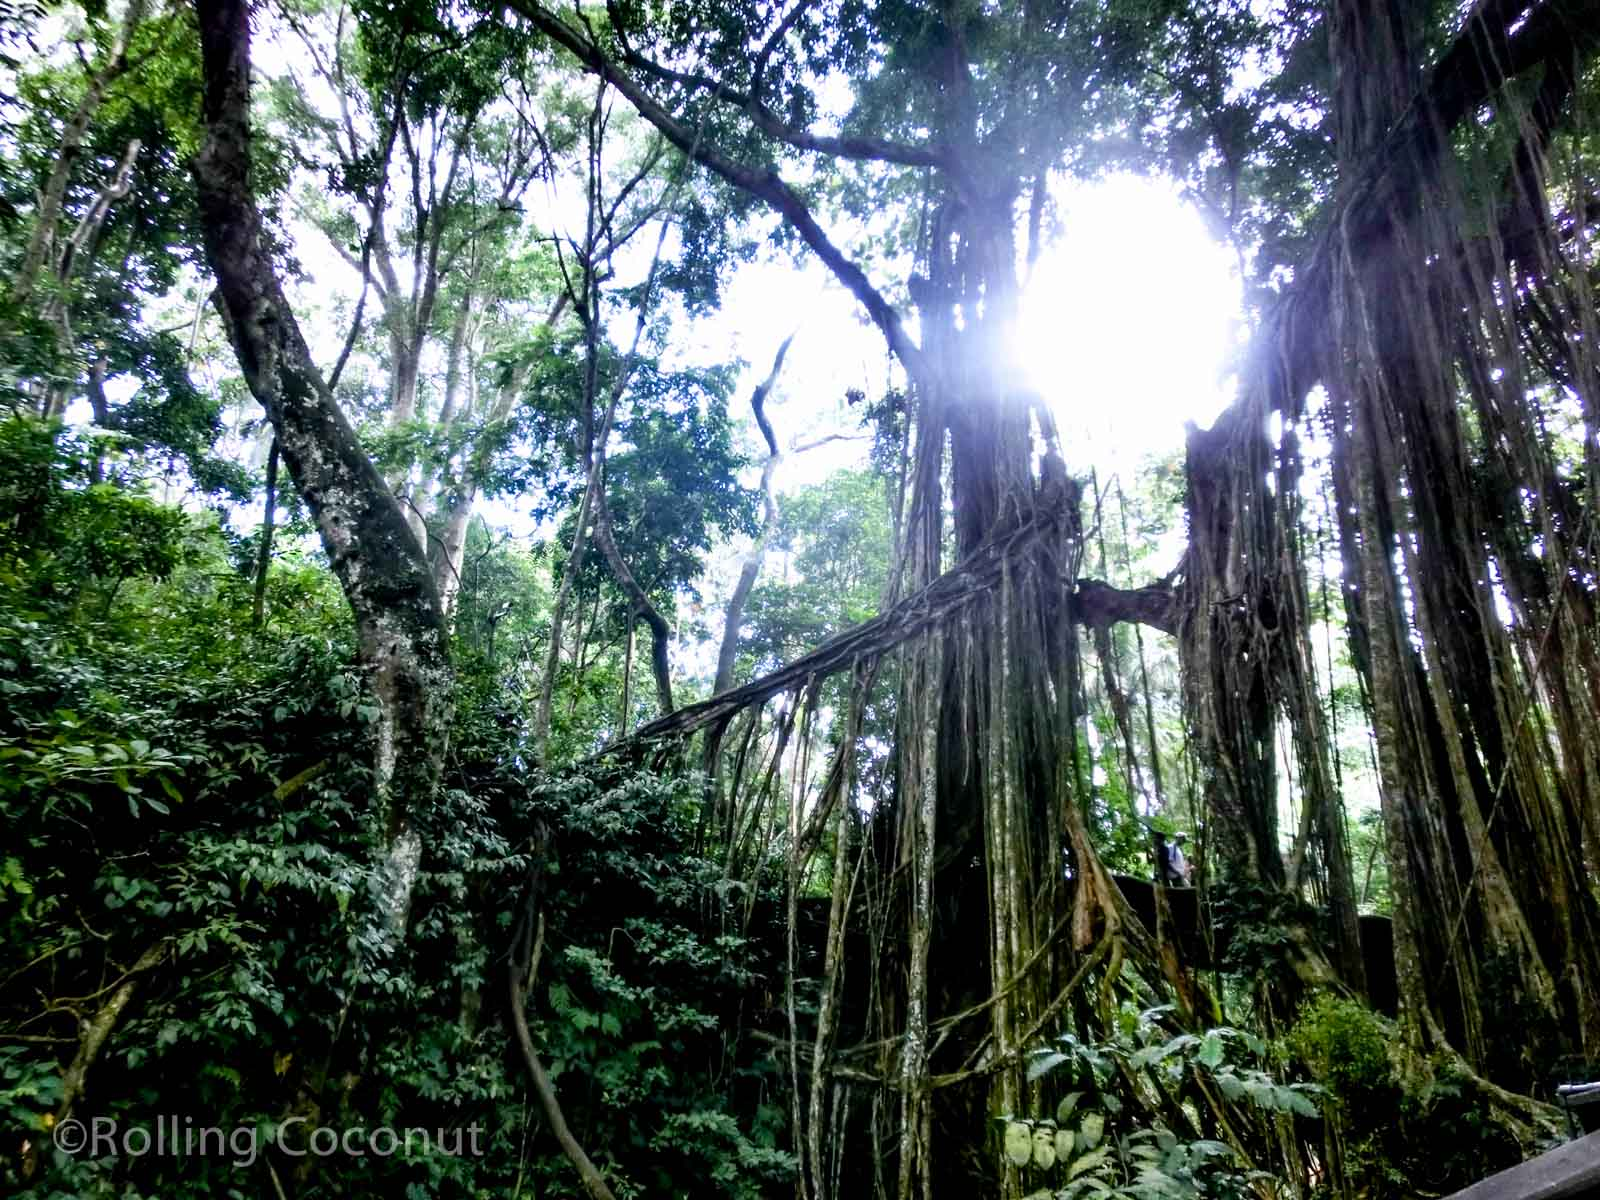 Trees Monkey Forest Ubud Bali Indonesia photo Ooaworld